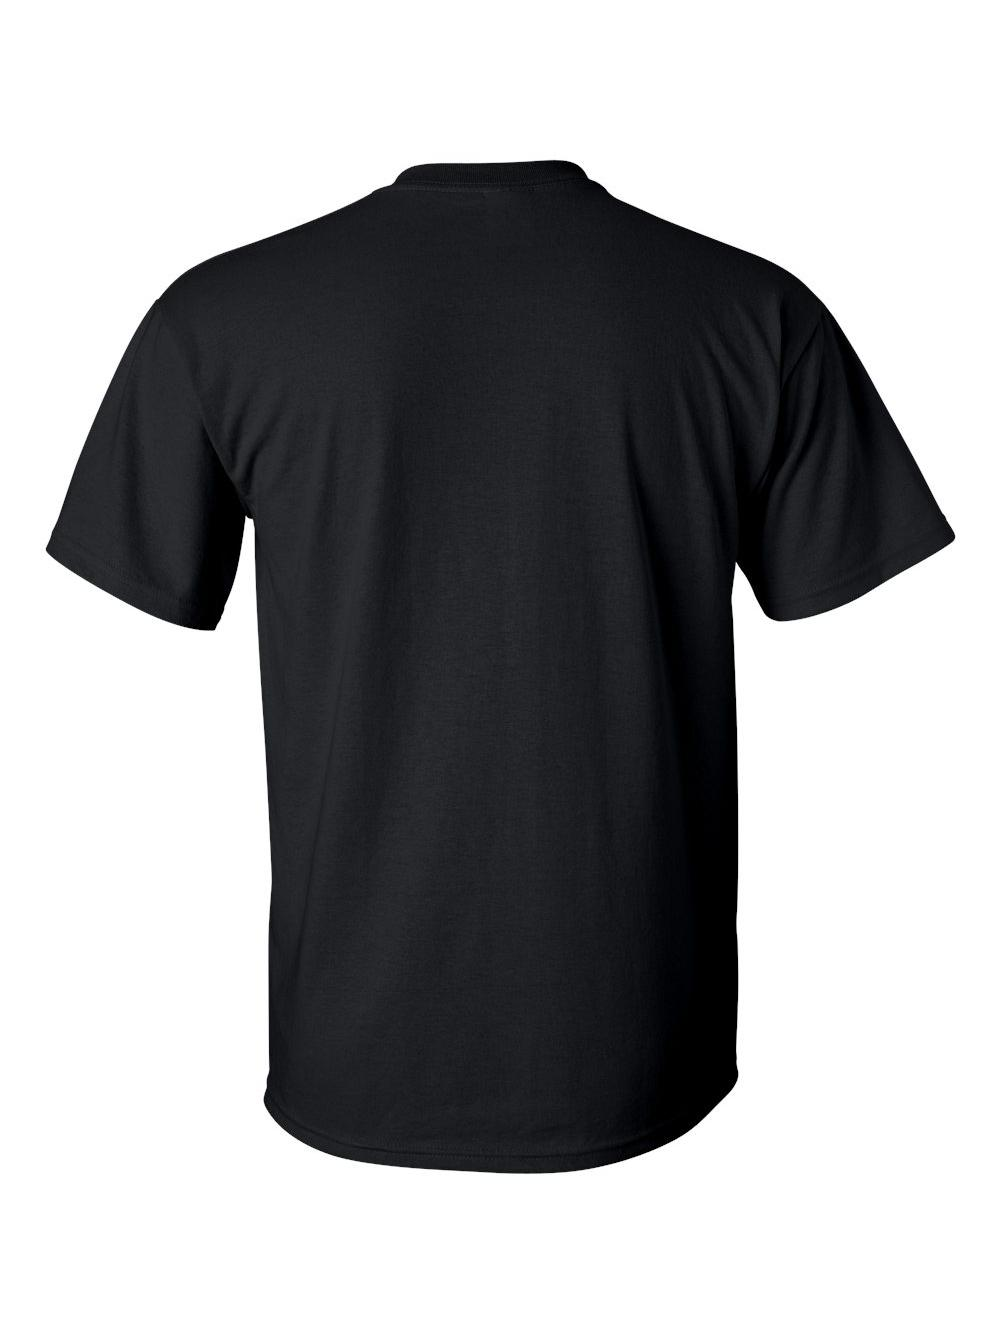 Gildan-Ultra-Cotton-T-Shirt-Tall-Sizes-2000T thumbnail 4